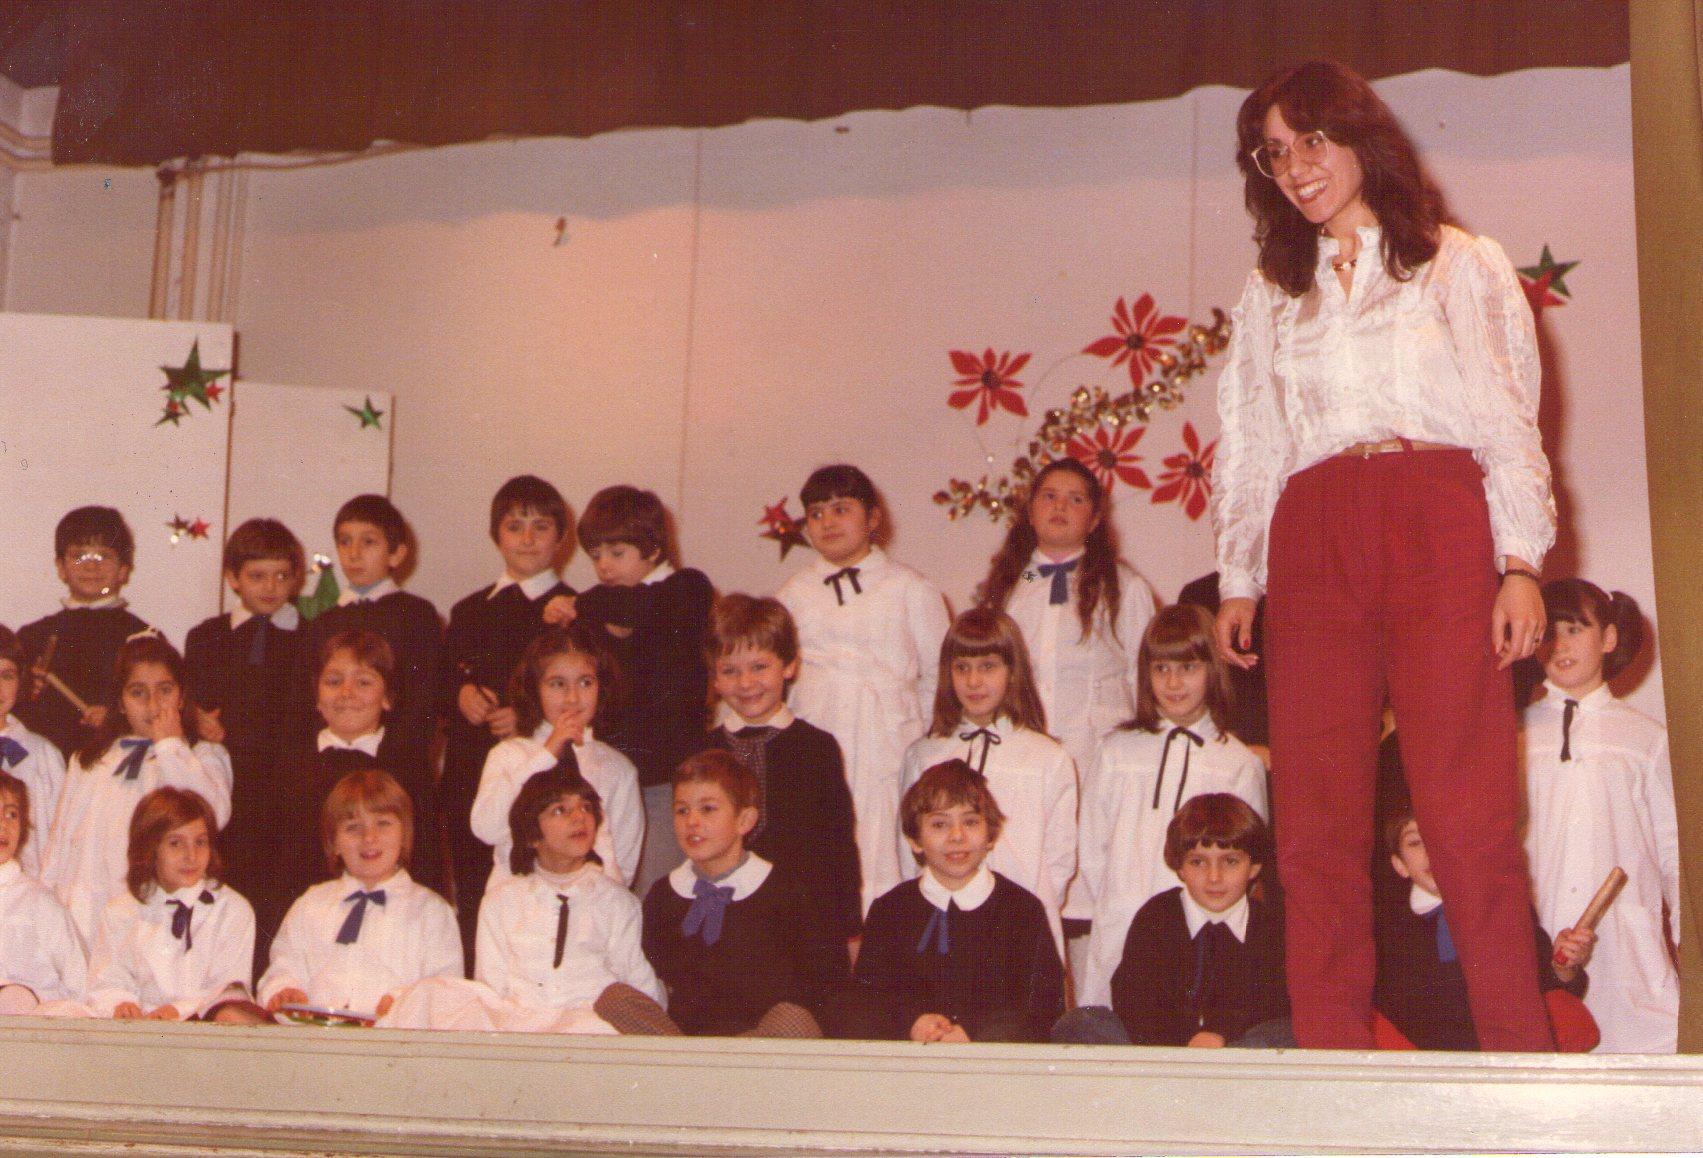 Natale 18-12-1982 classe 3^B